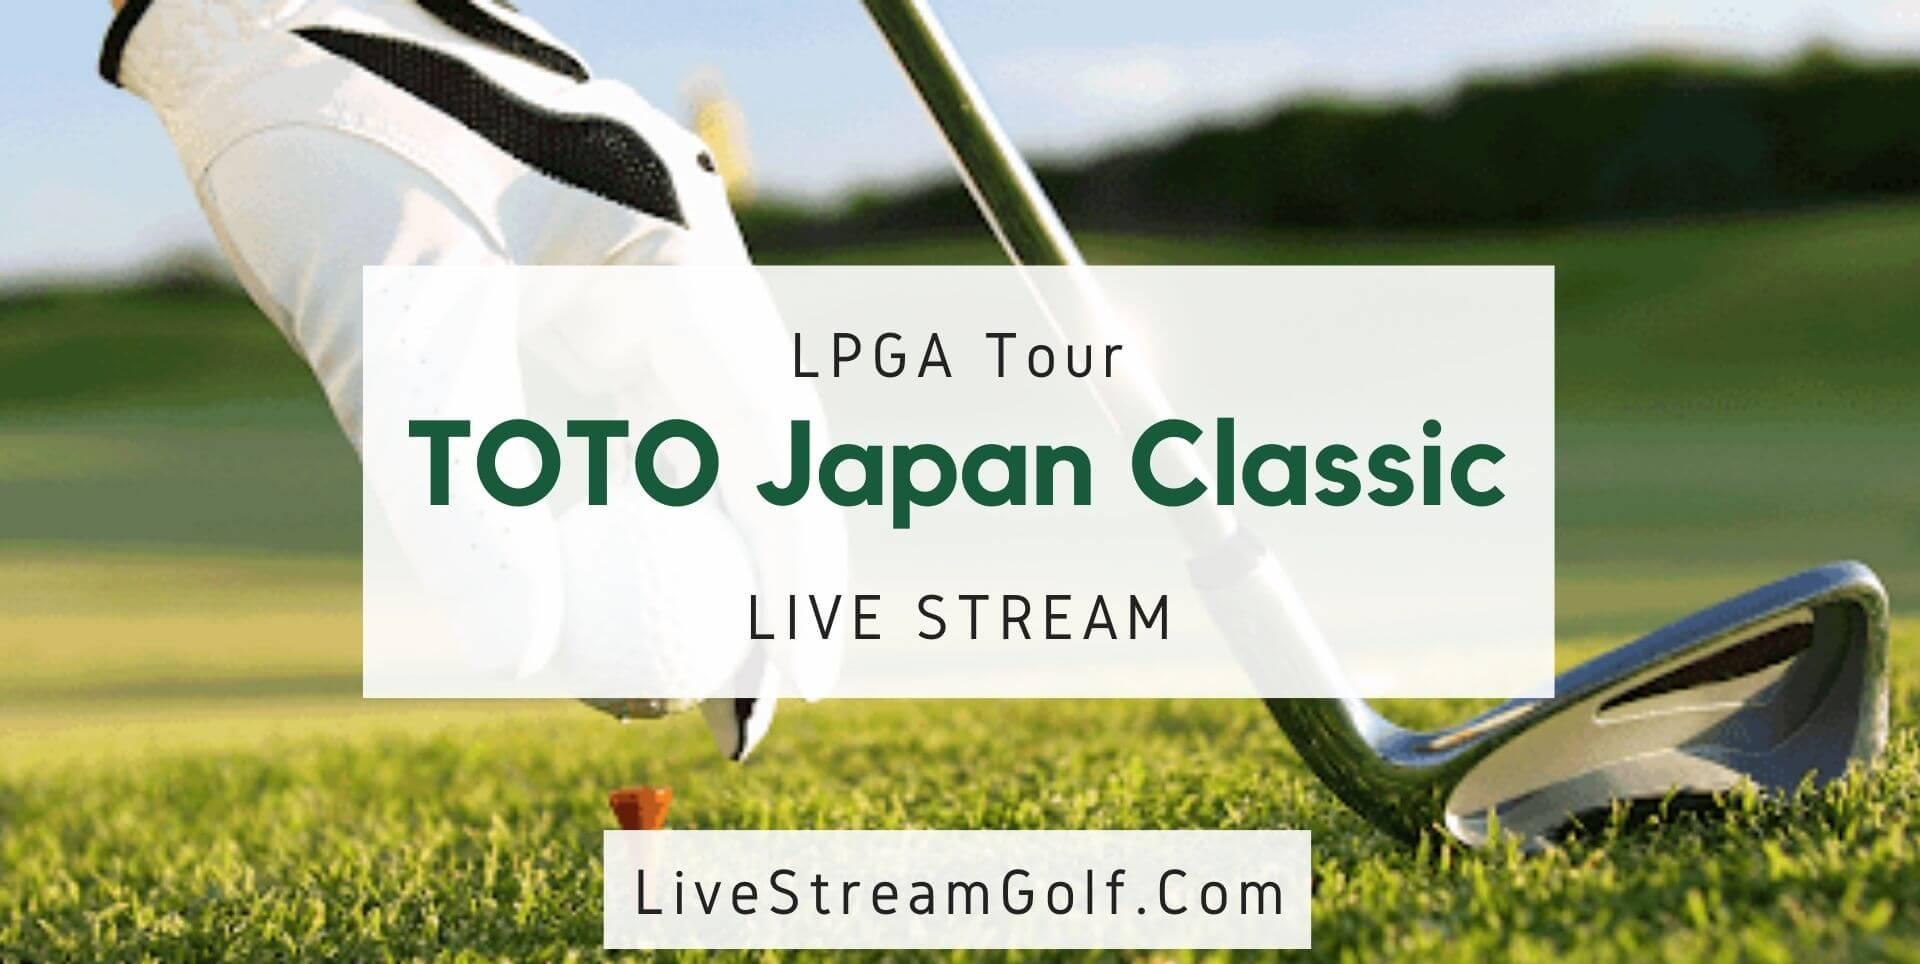 TOTO Japan Classic Rd 1 Live Stream: LPGA Tour 2021